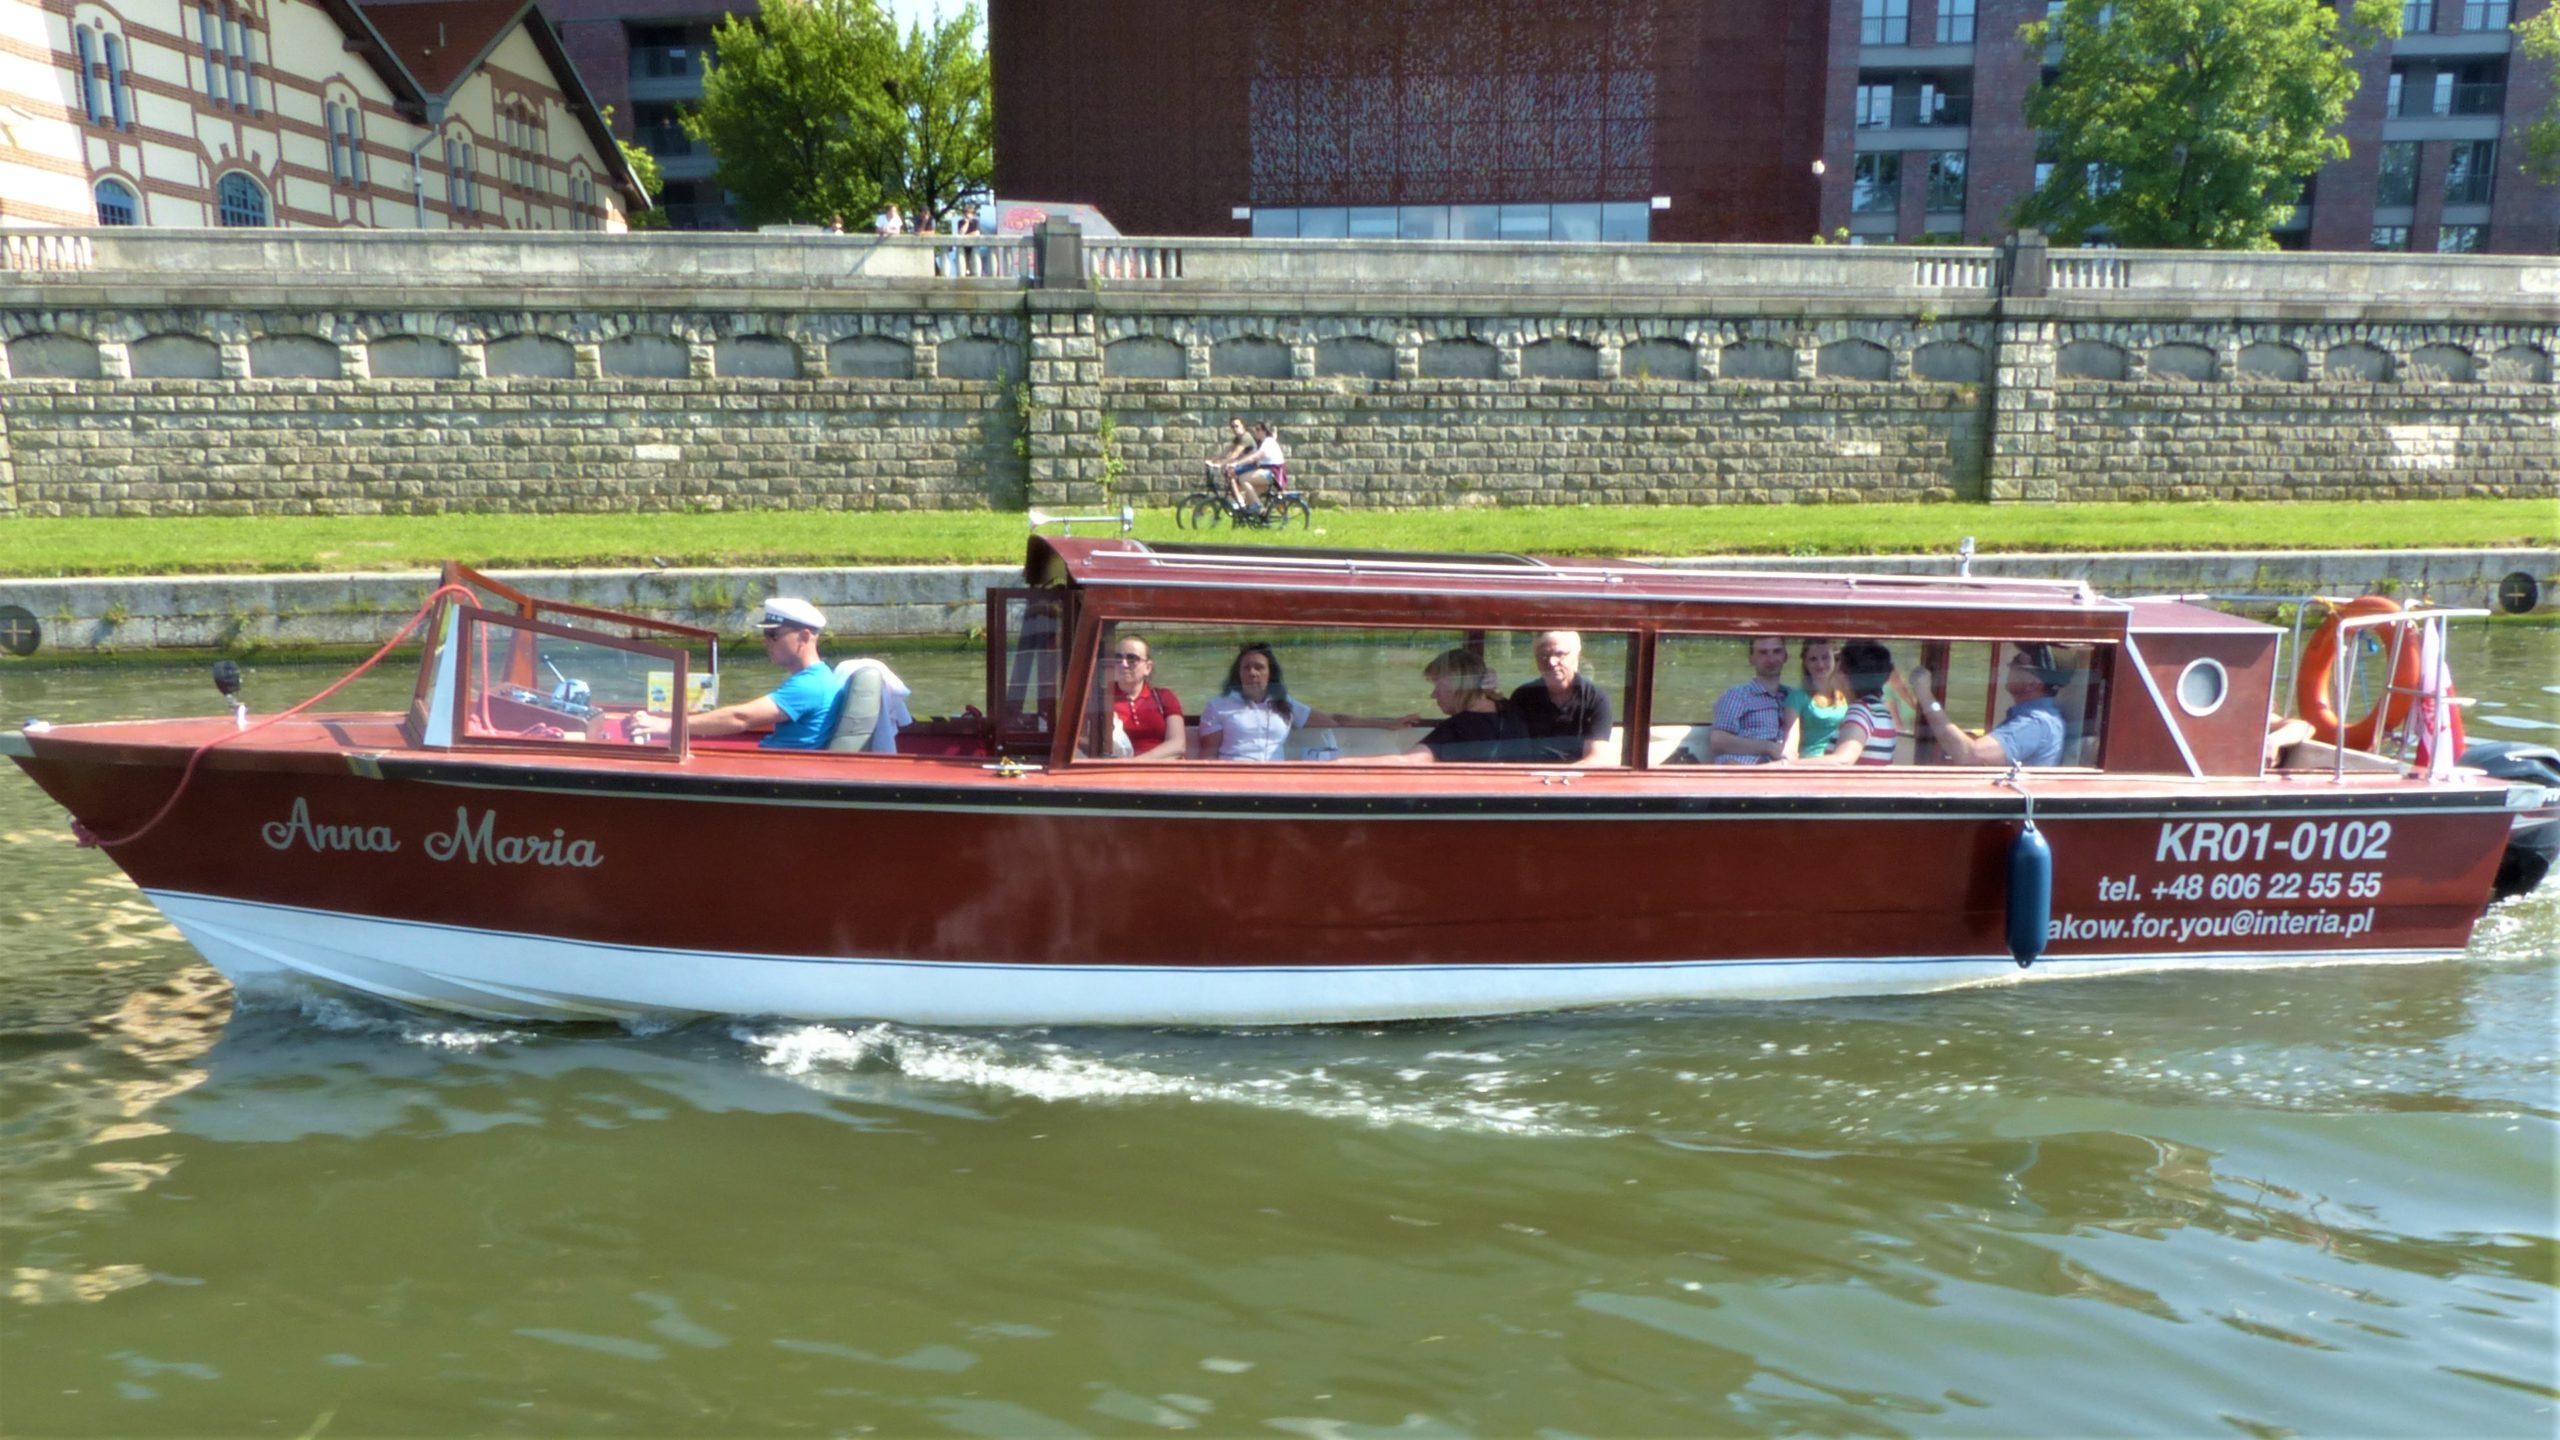 anna maria łódka